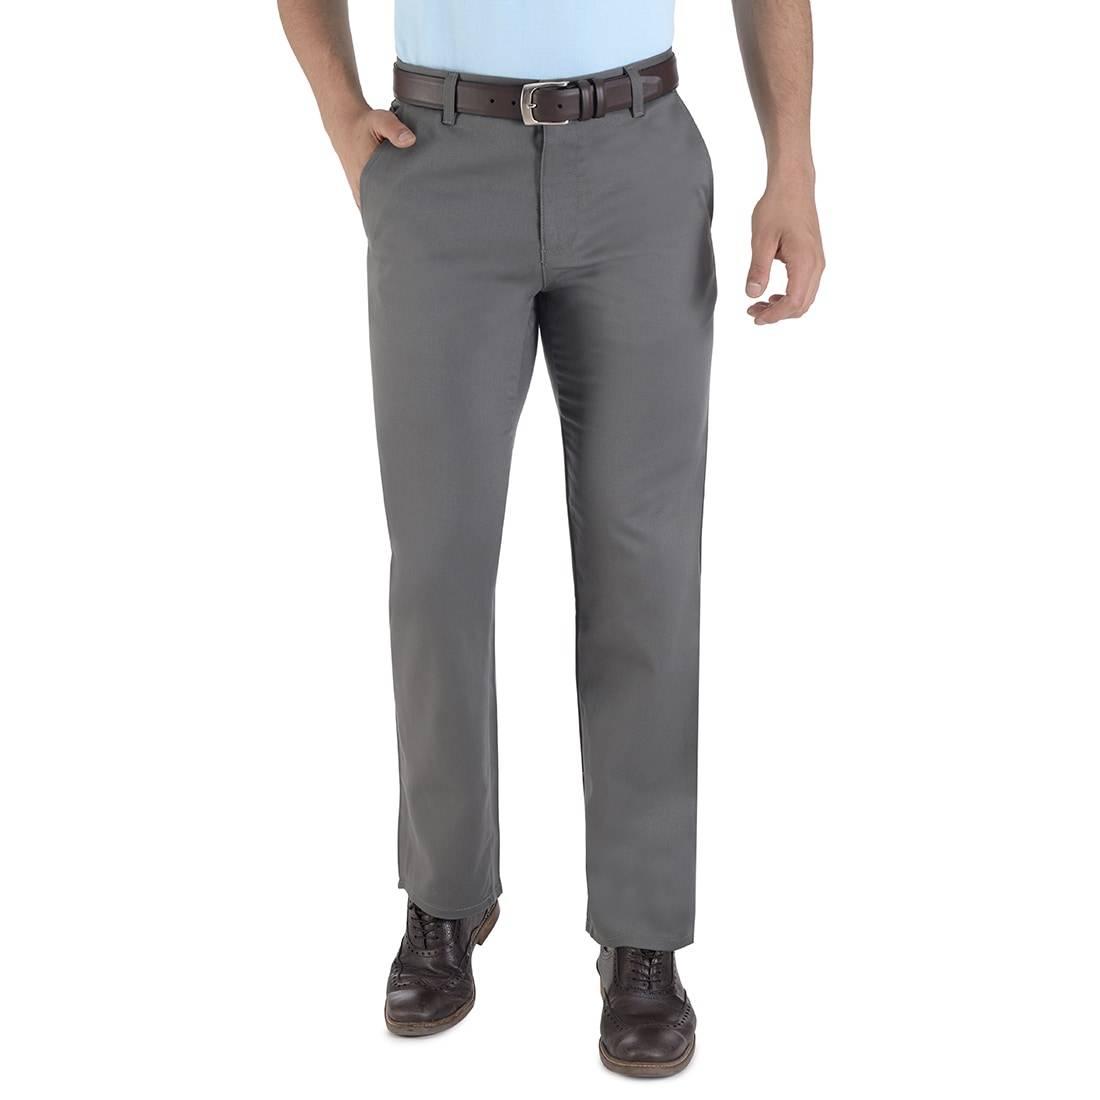 010920418906-01-Pantalon-Casual-Slim-Fit-Oxford-yale